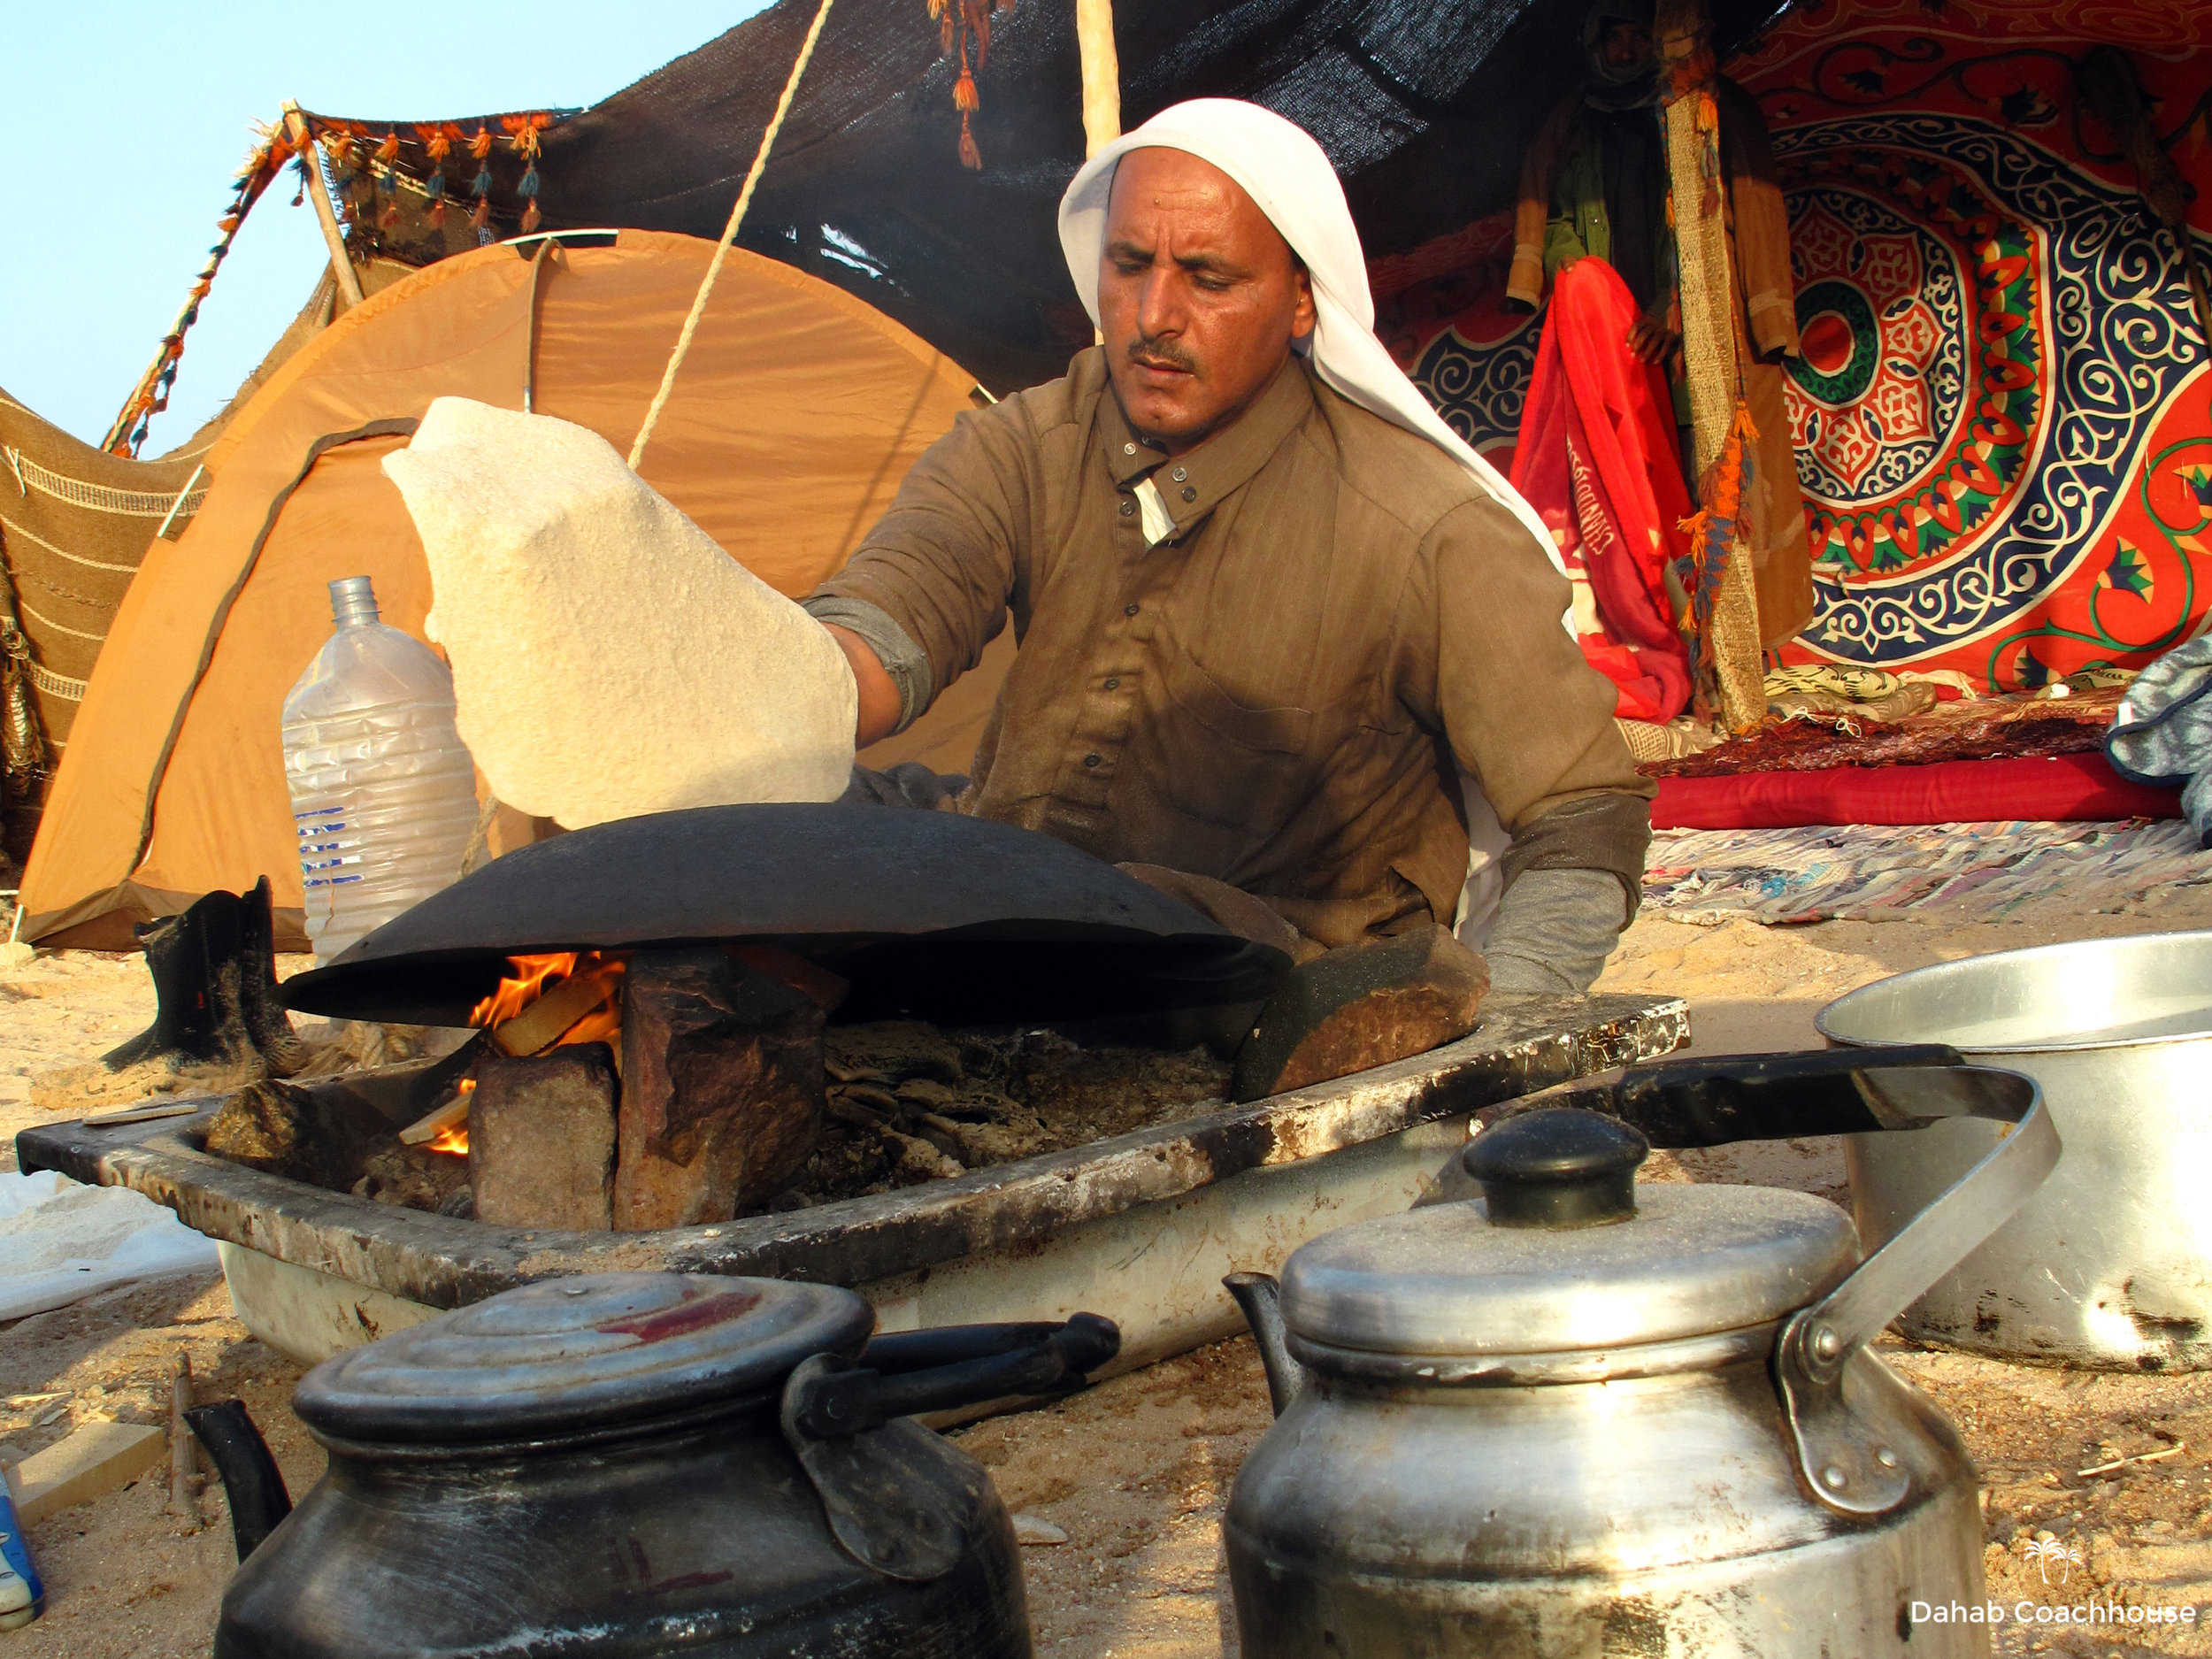 Dahab_Coachhouse_Sinai_Egypt_Dahab_Ras_Mohammed_Camping_Bedouin_Bread.JPG